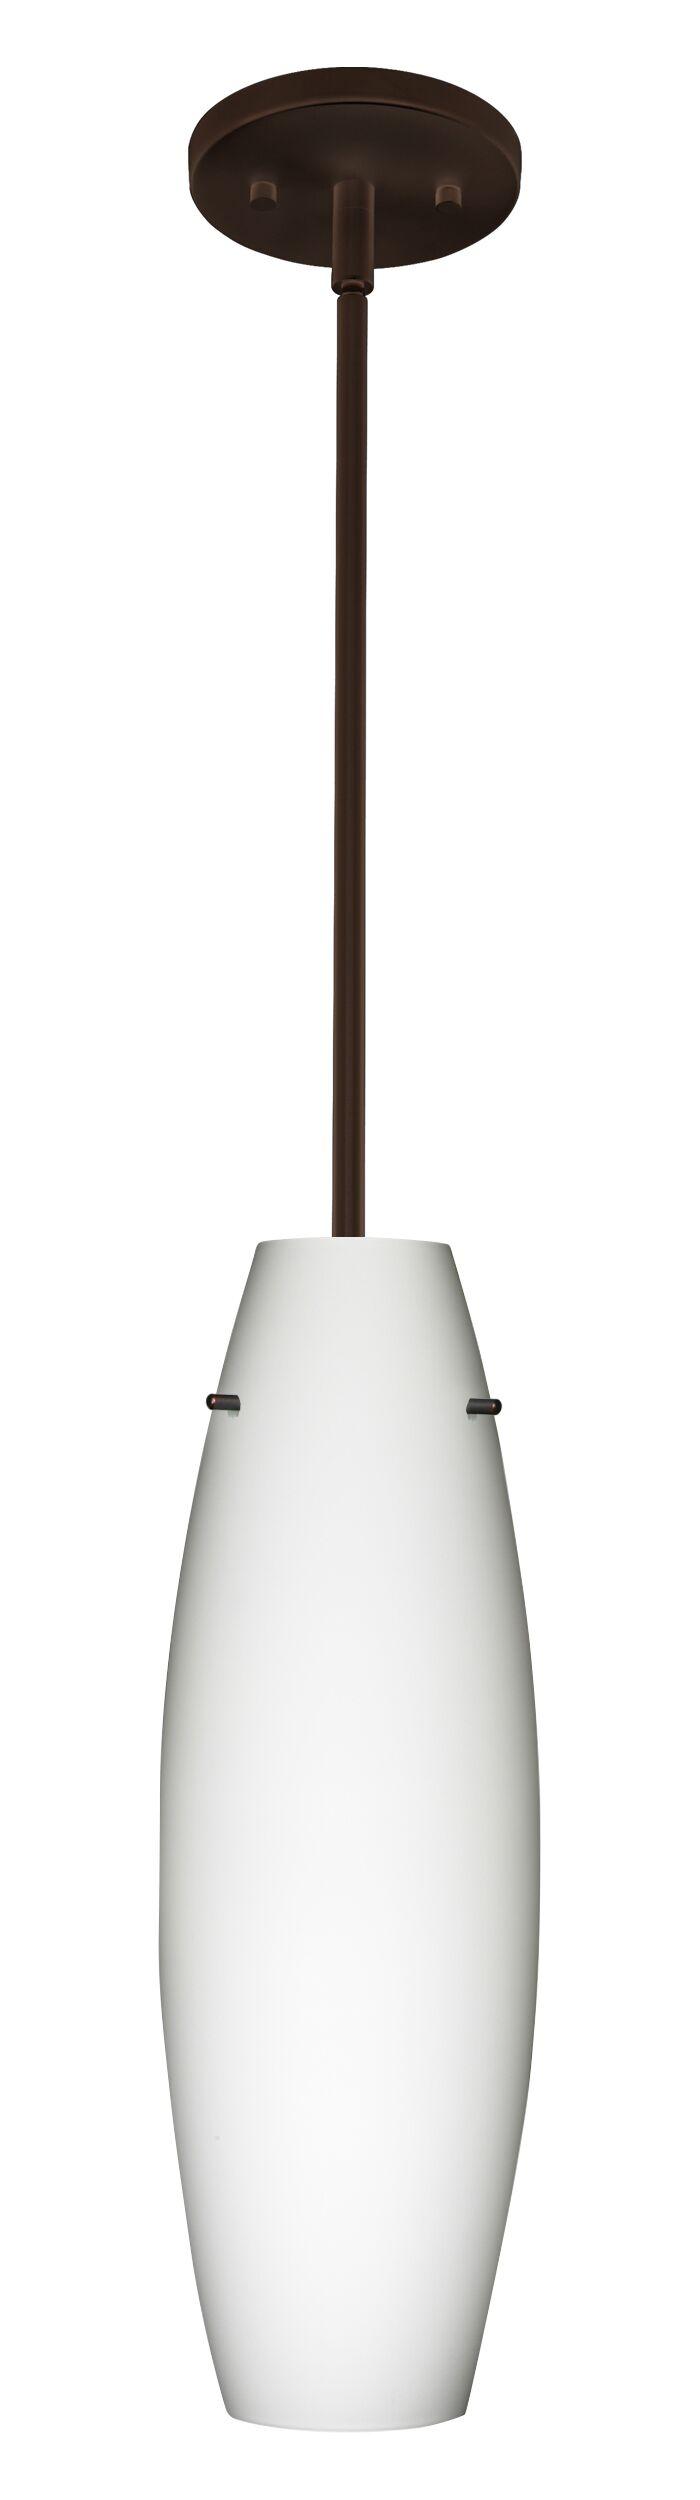 Tara 1-Light Cylinder Pendant Finish: Bronze, Glass Shade: Opal Matte, Bulb Type: LED